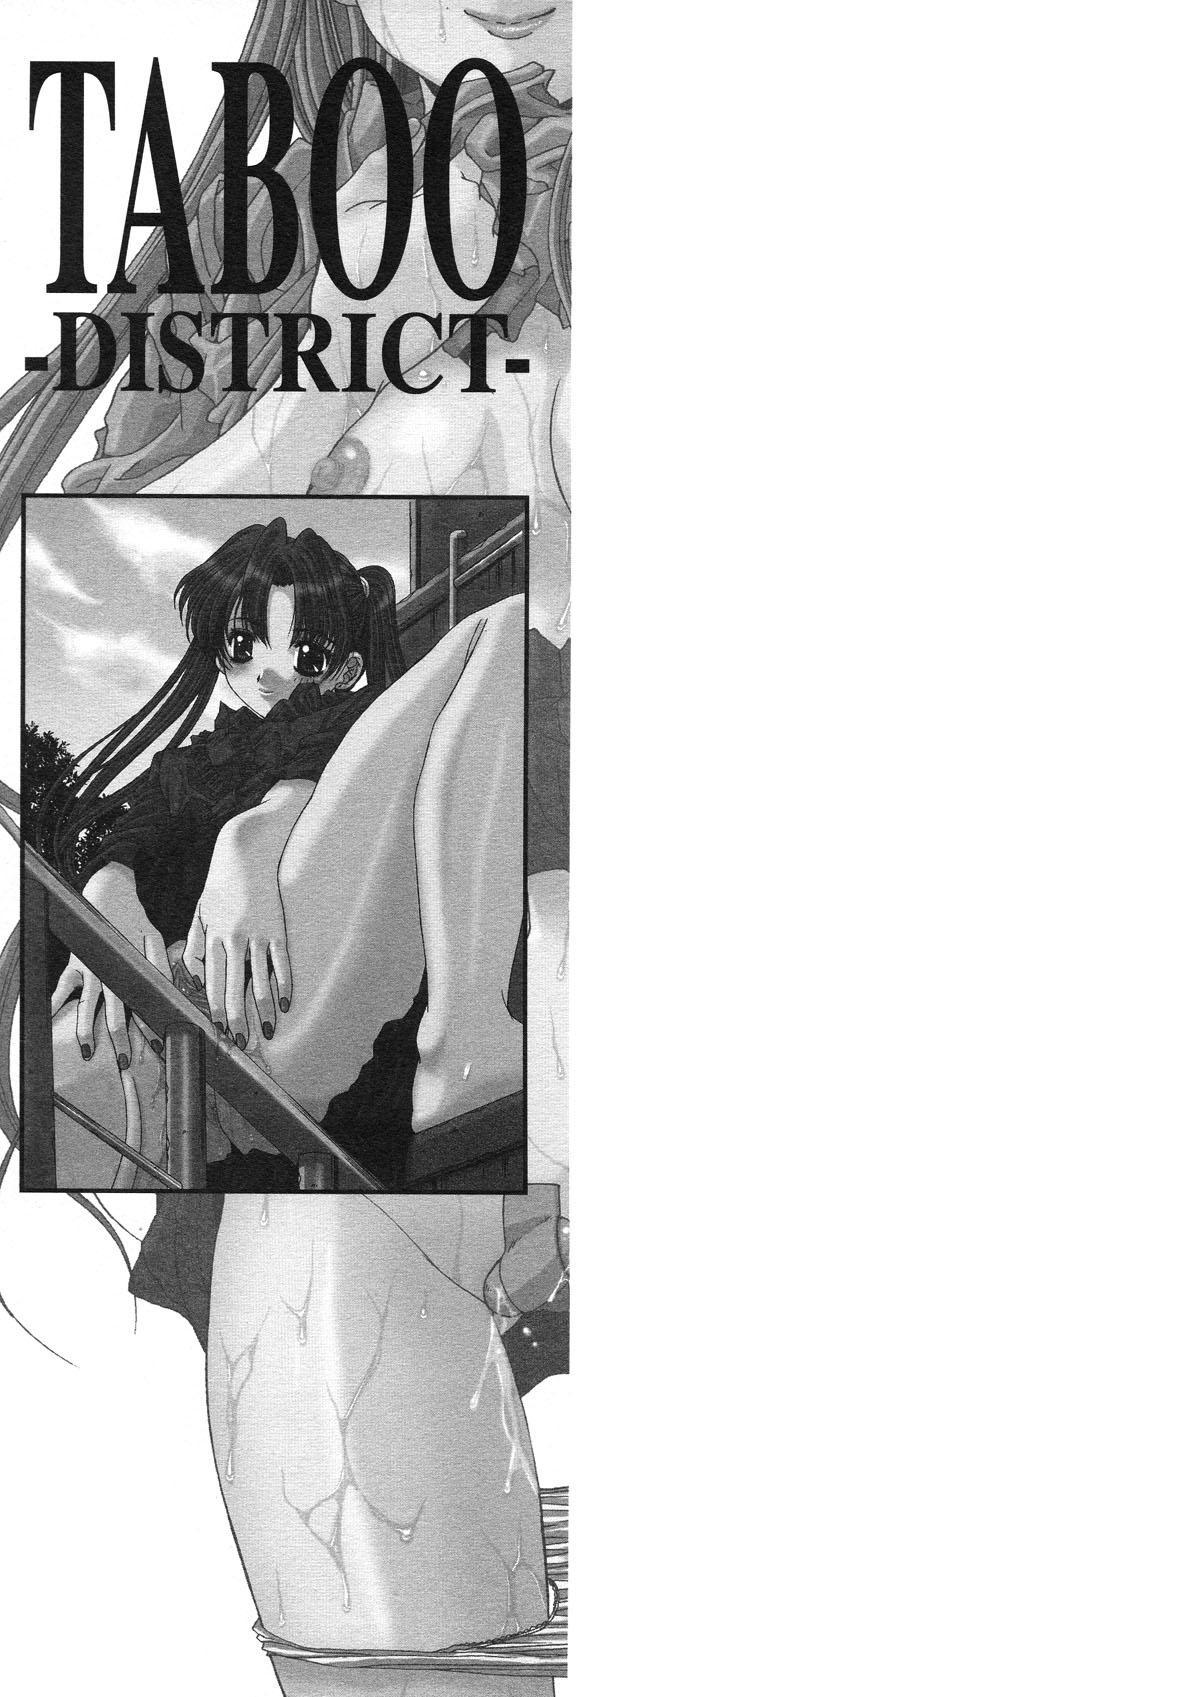 [Yuuki] Kinryouku -Taboo- | Taboo District [English] 172